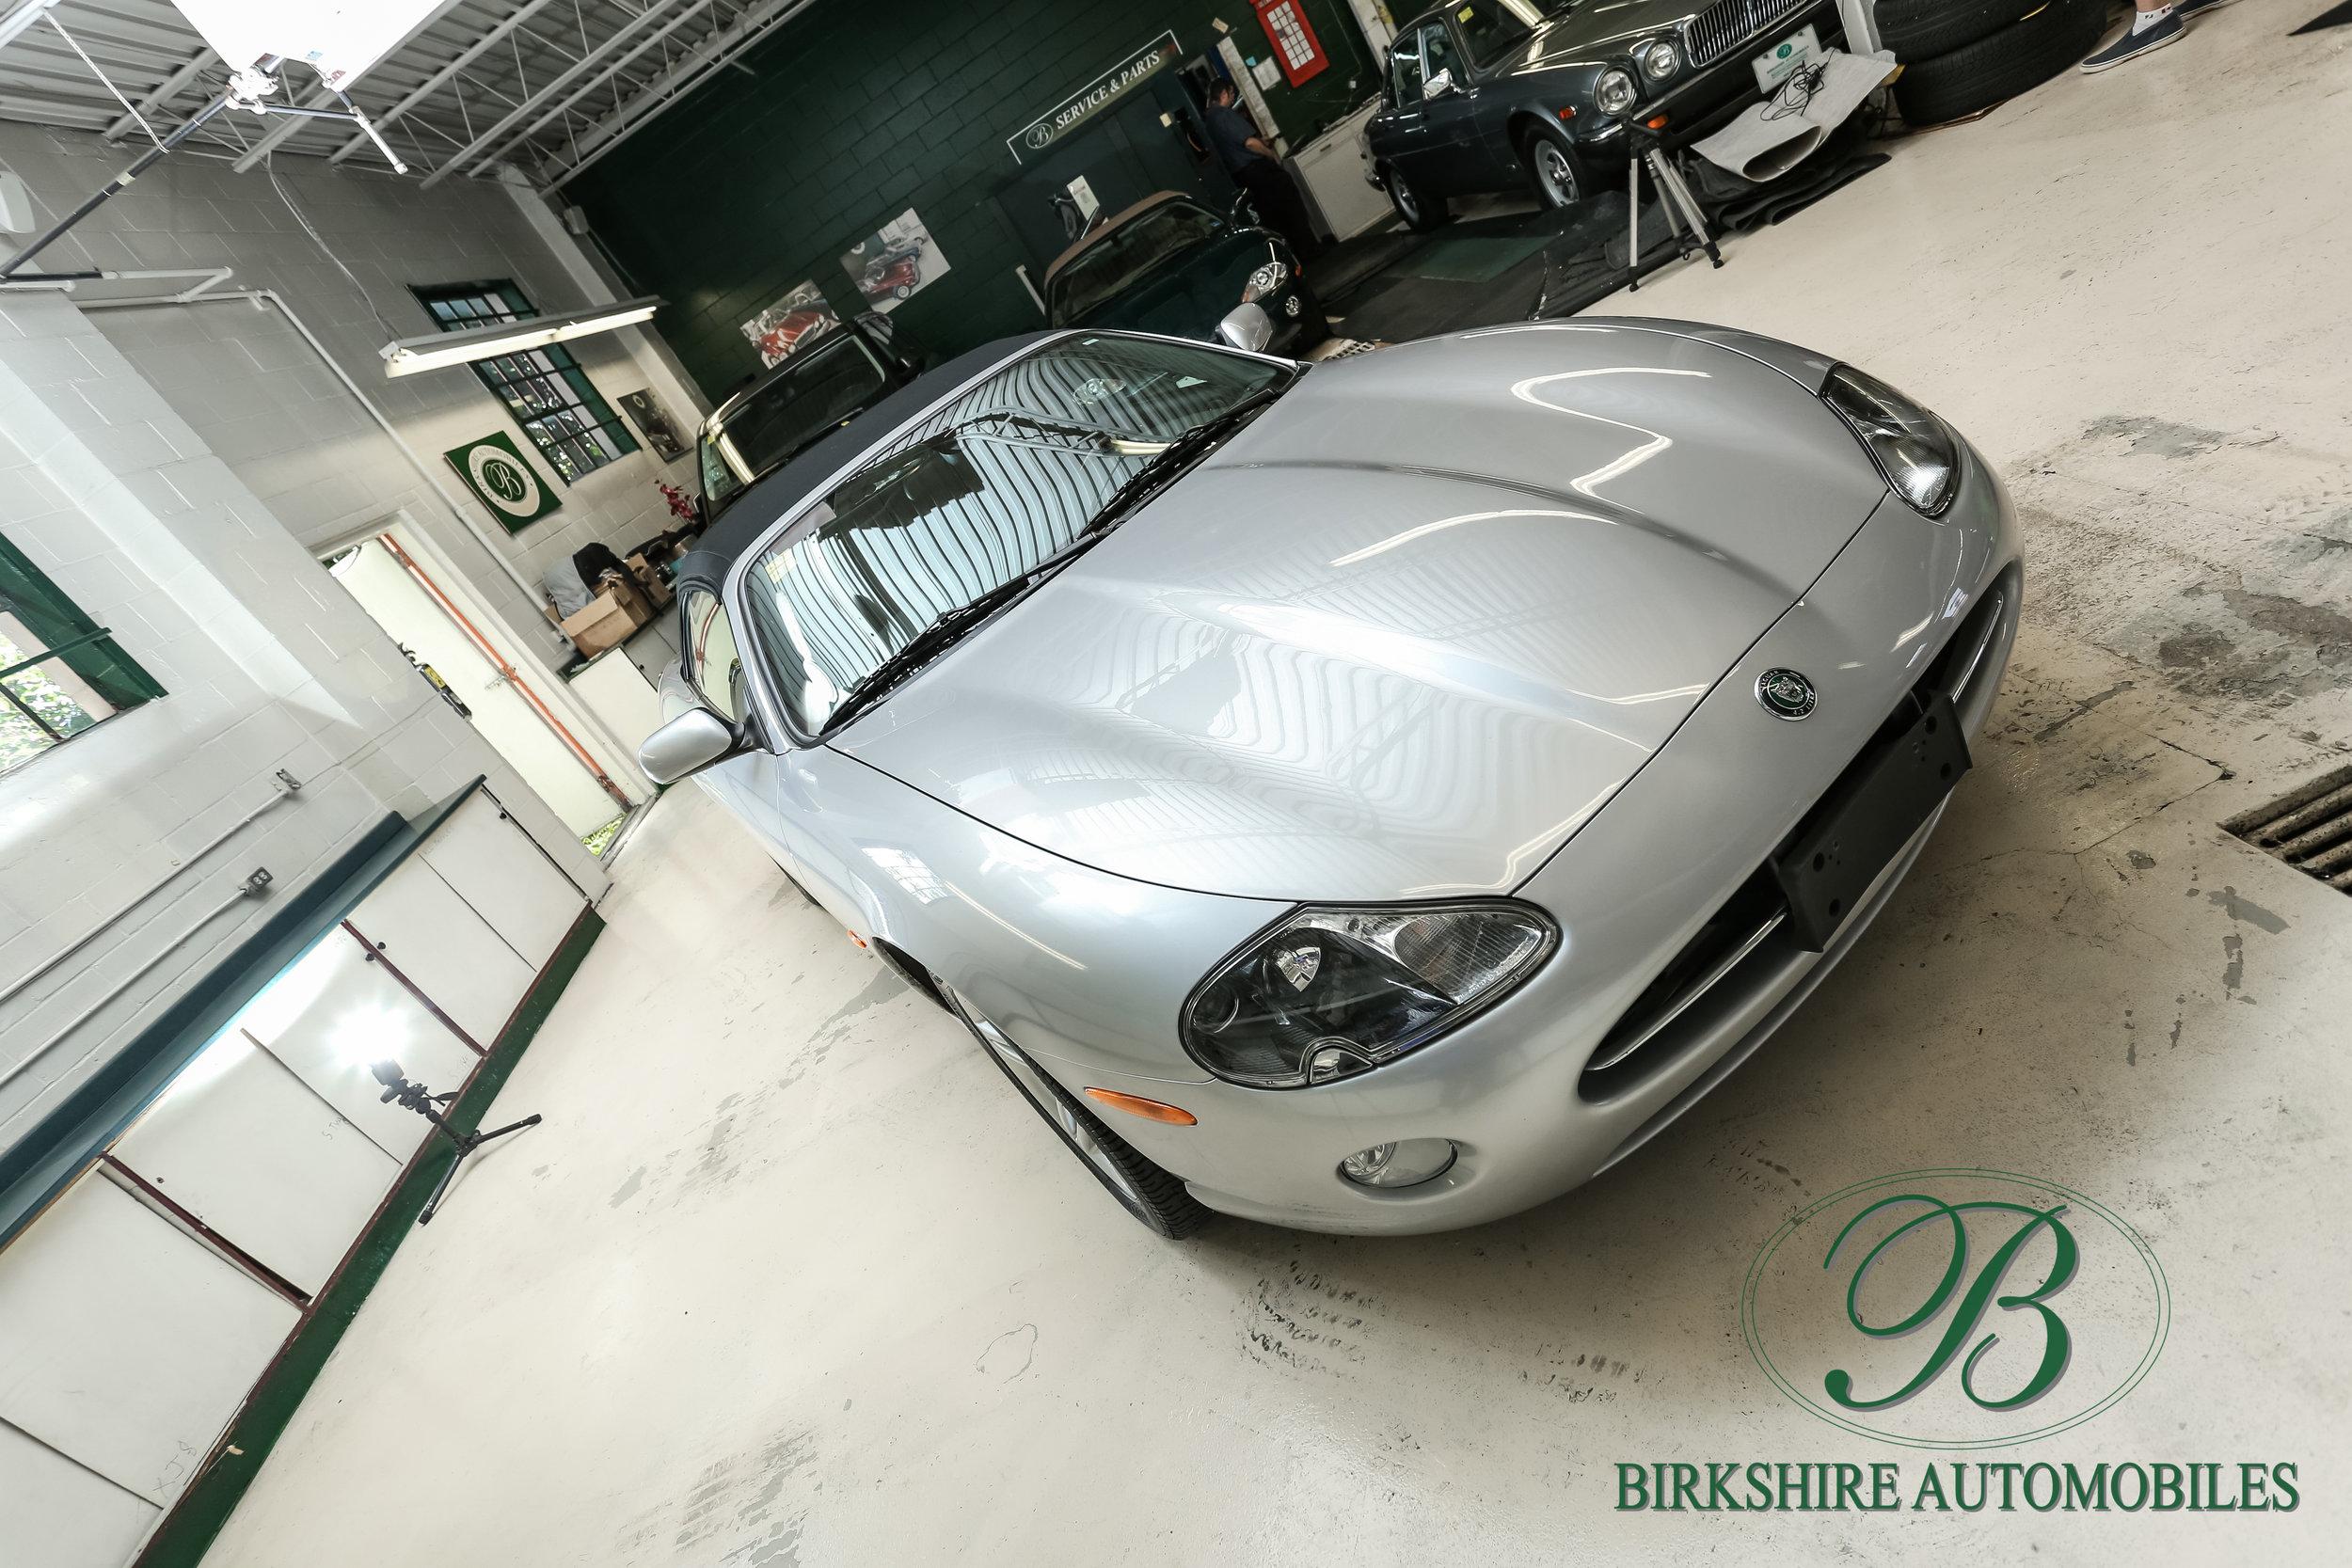 Birkshire Automobiles-217.jpg